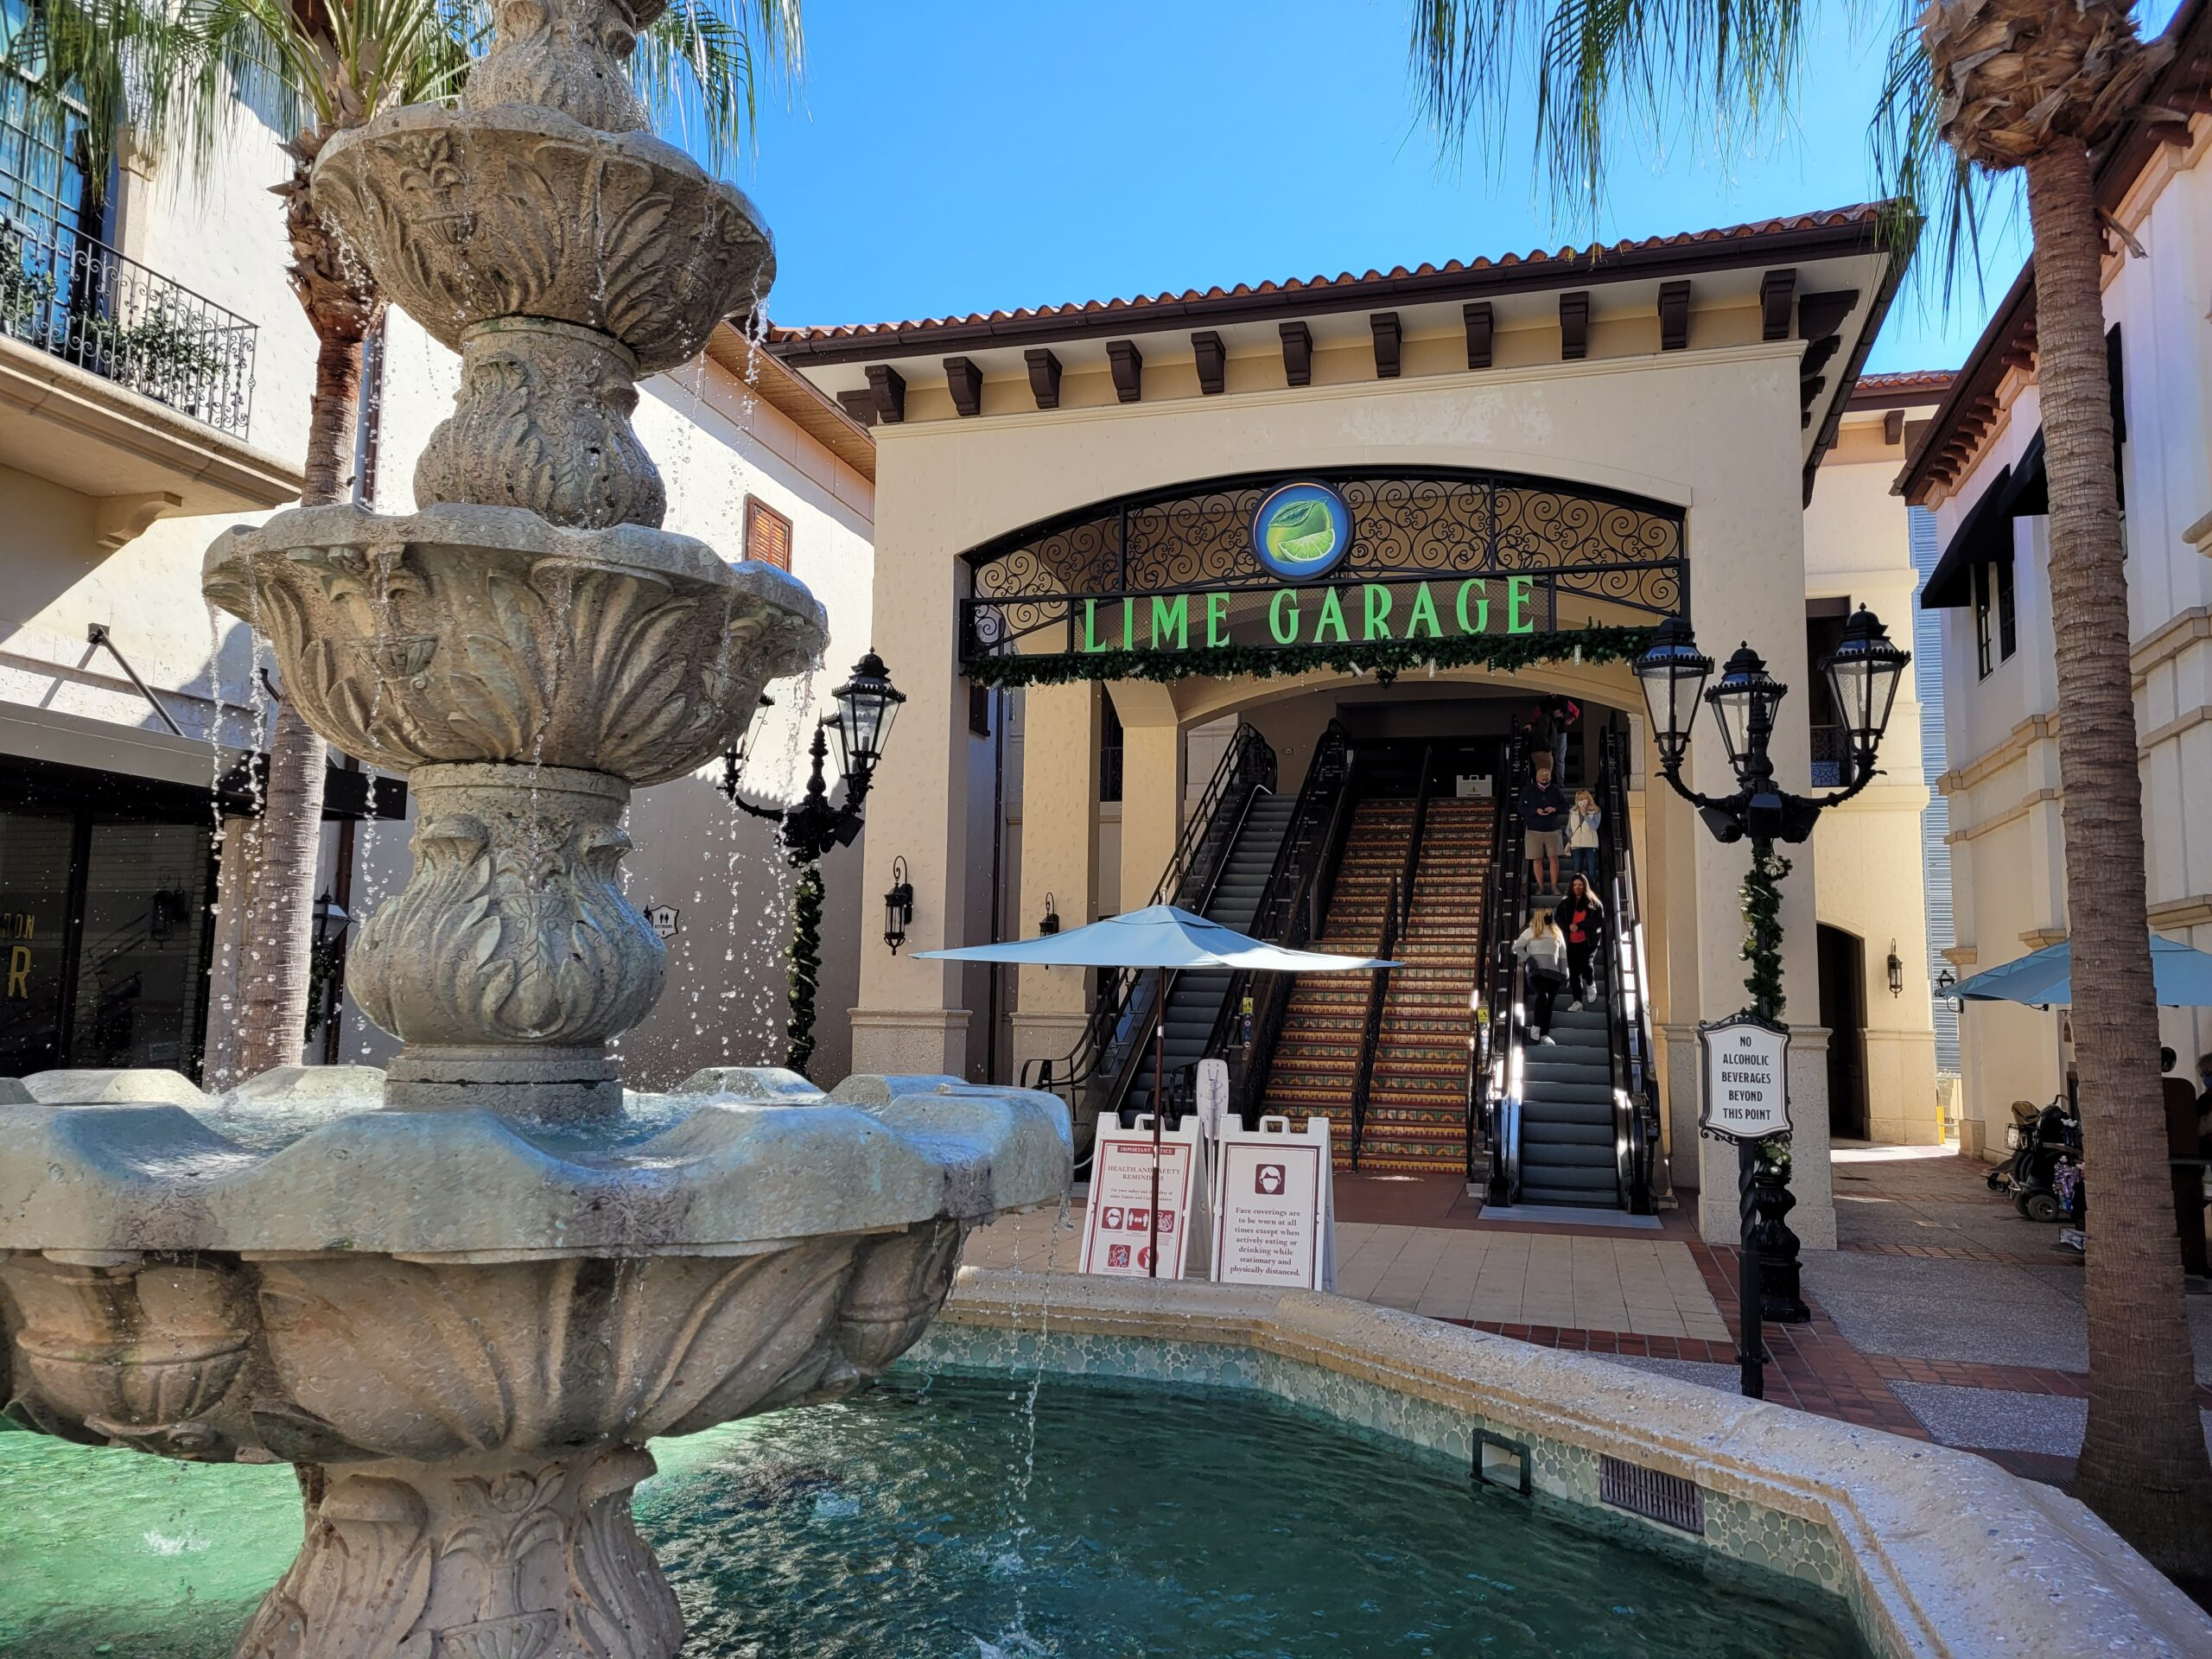 Lime Garage Entrance to Disney Springs